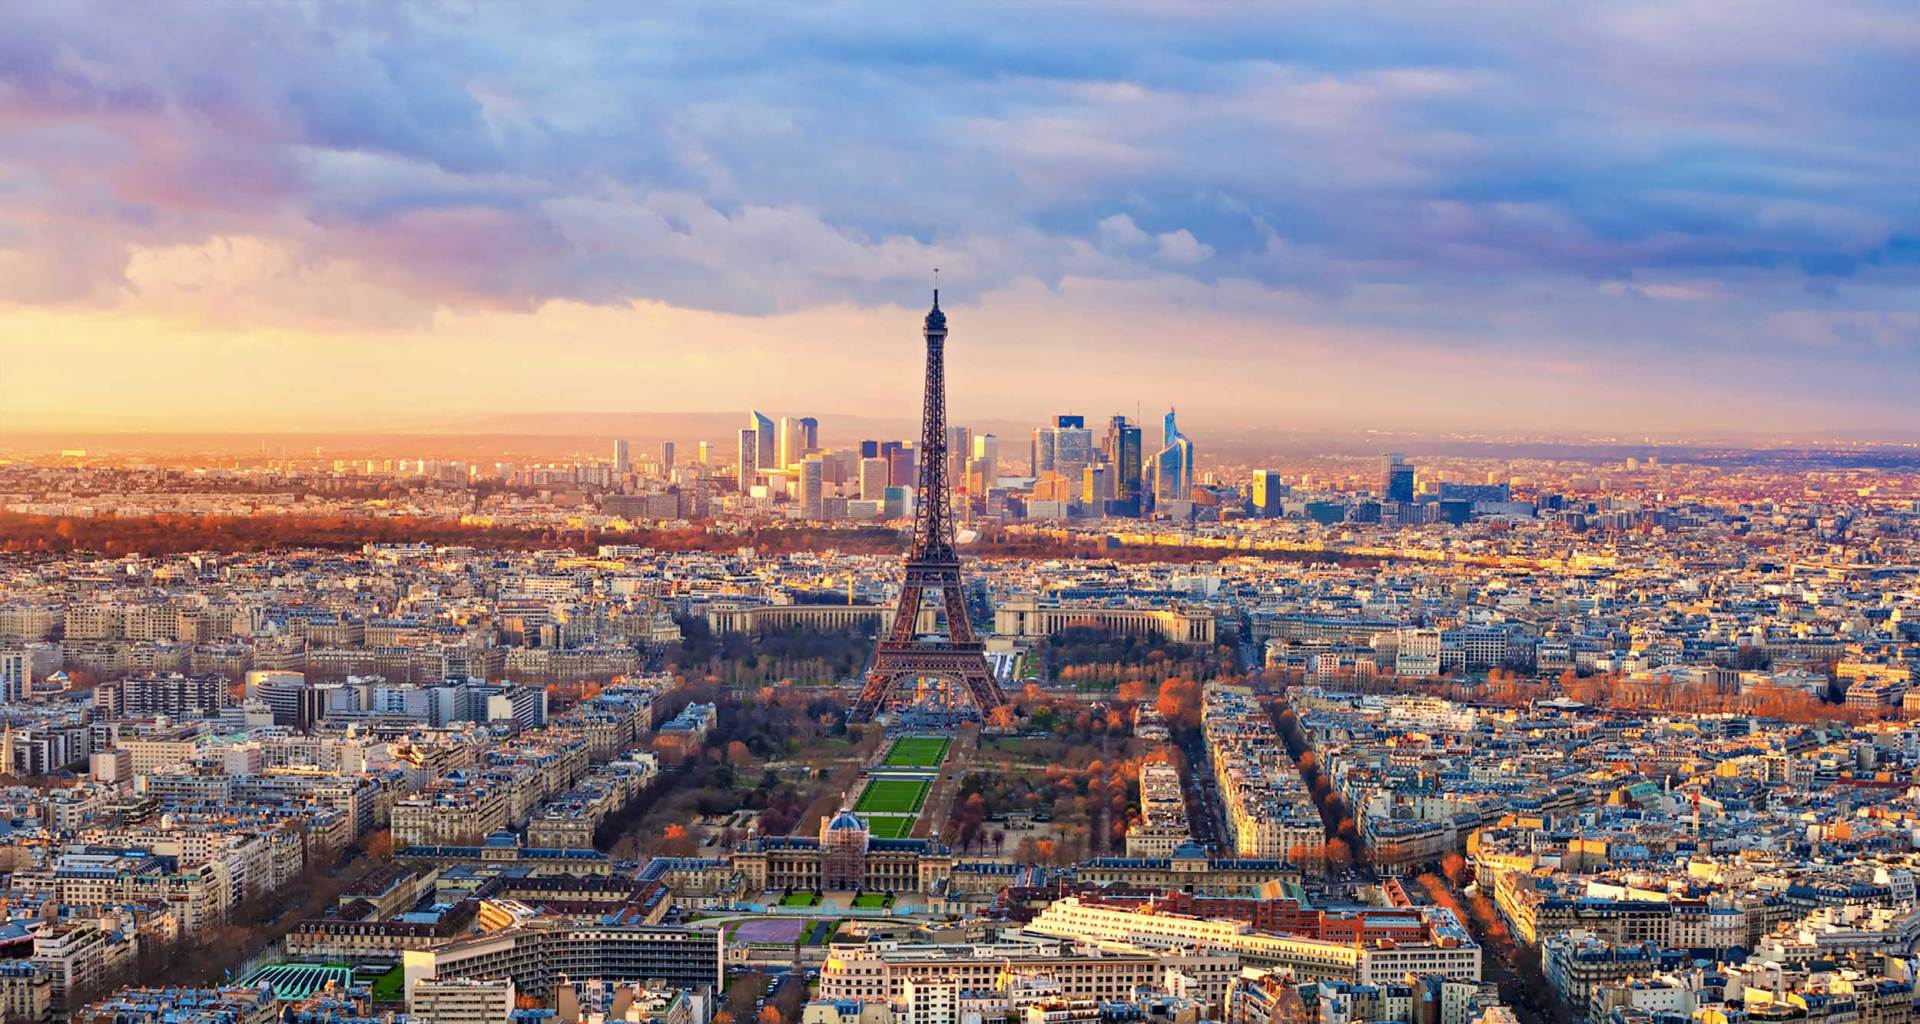 Paris, France skyline.